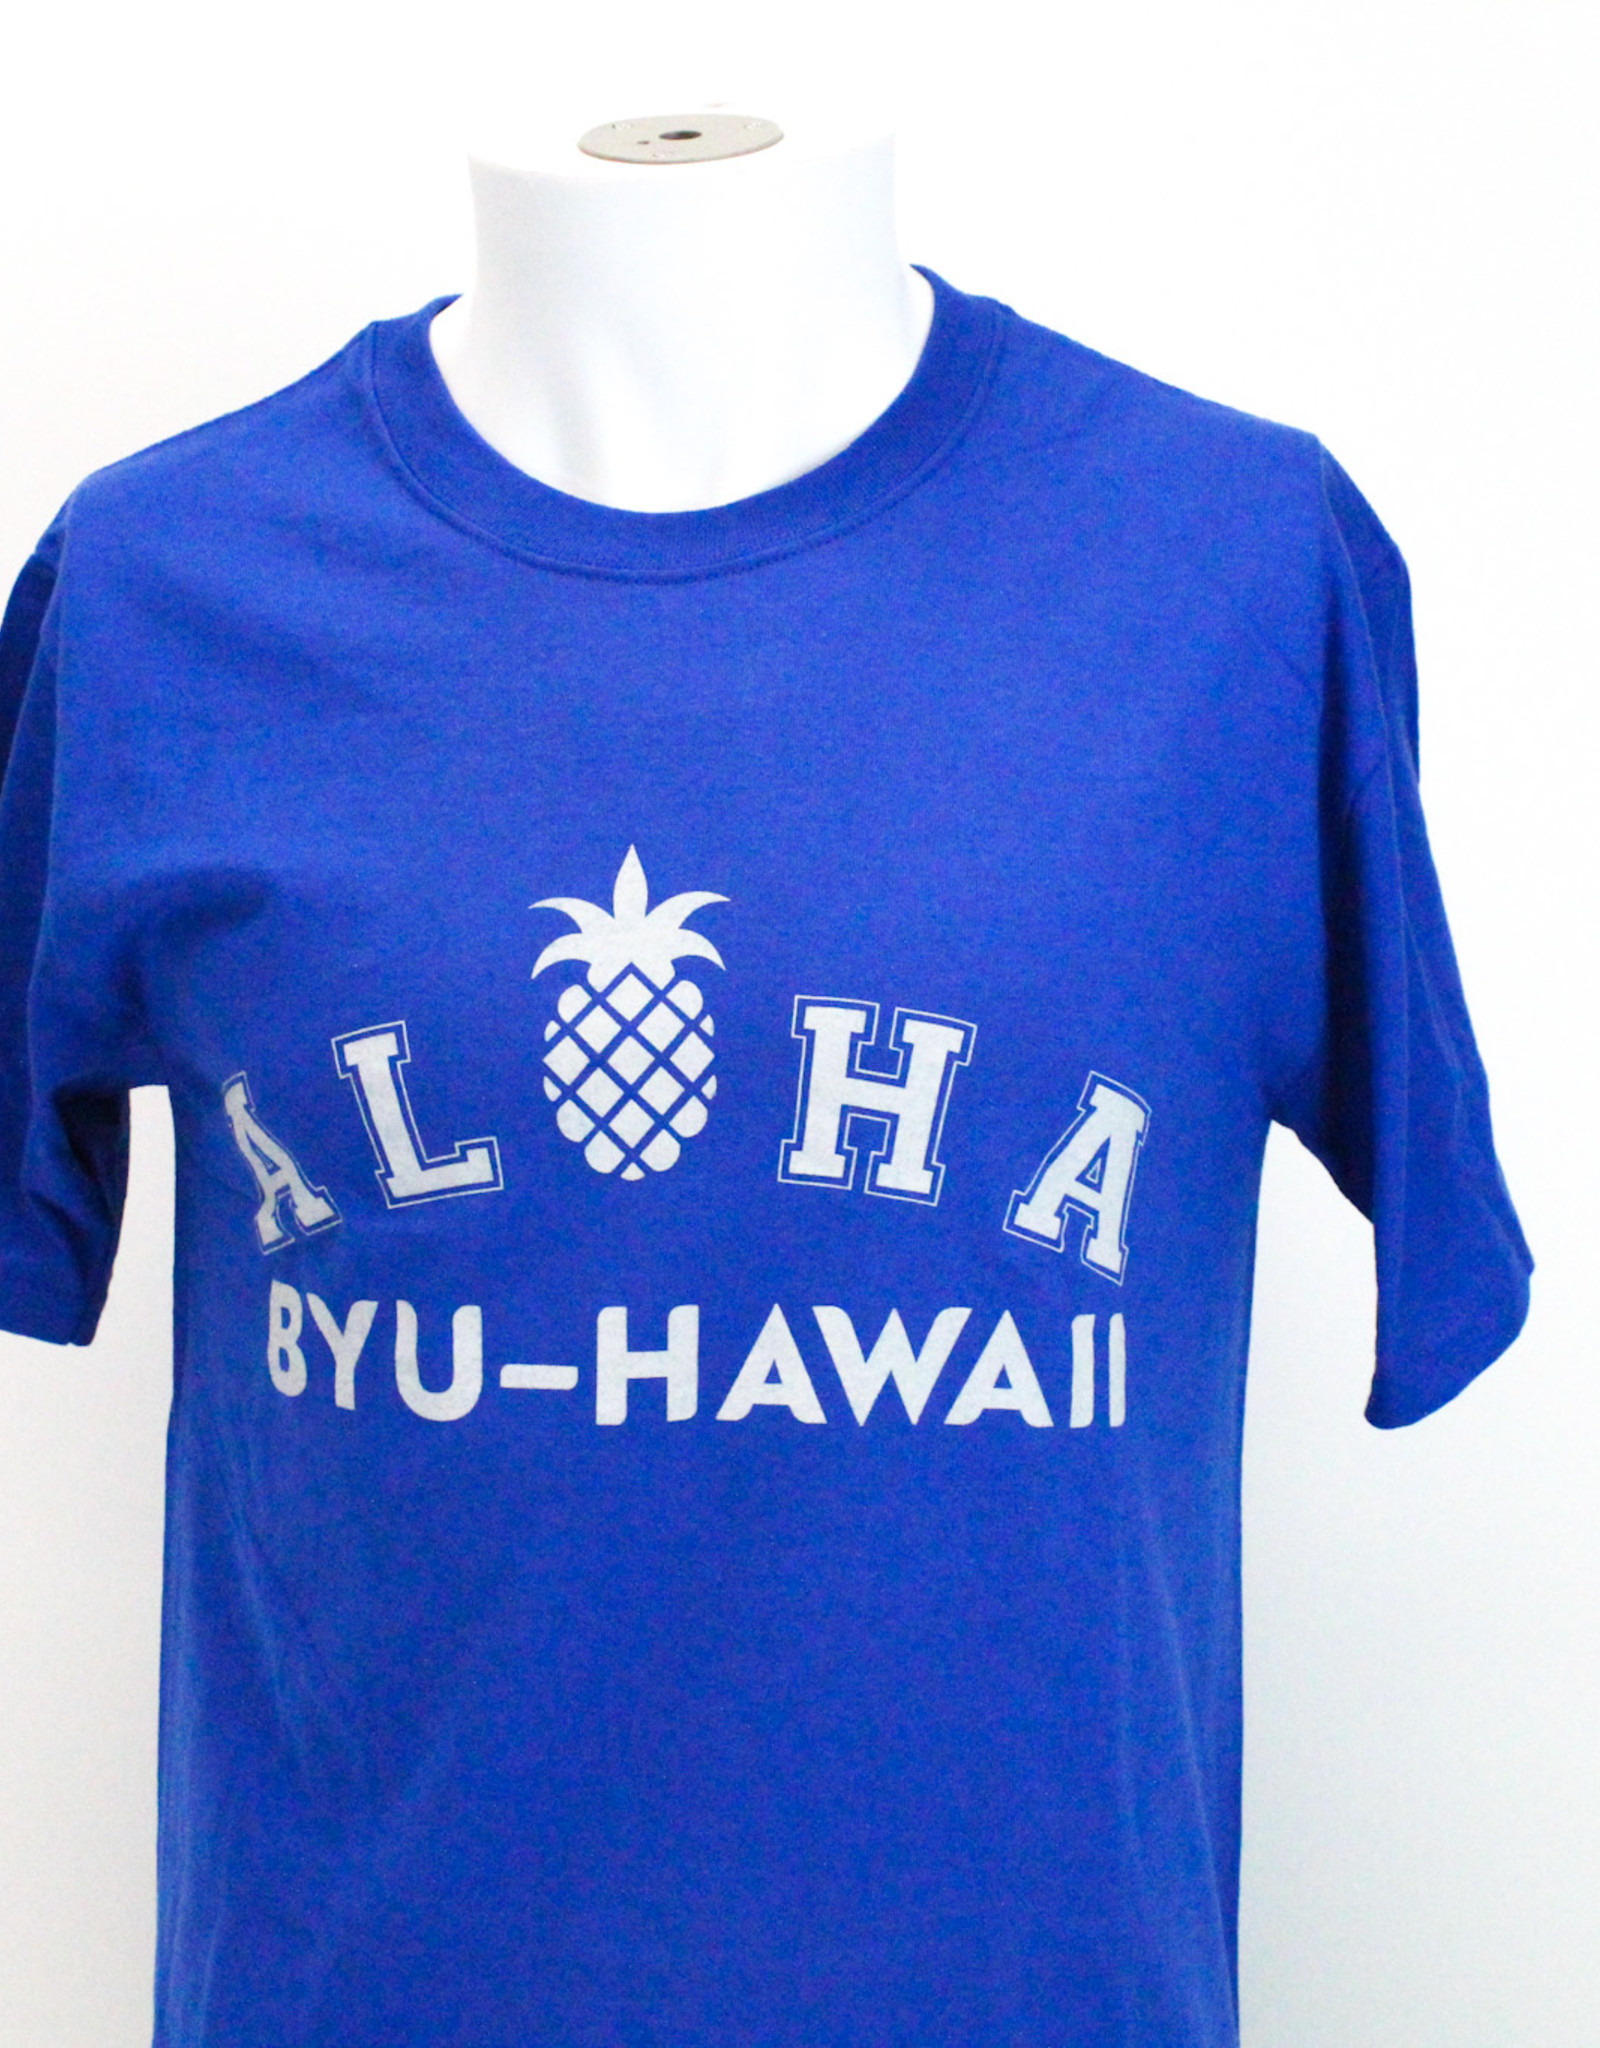 BYU-Hawaii Aloha Pineapple Tee